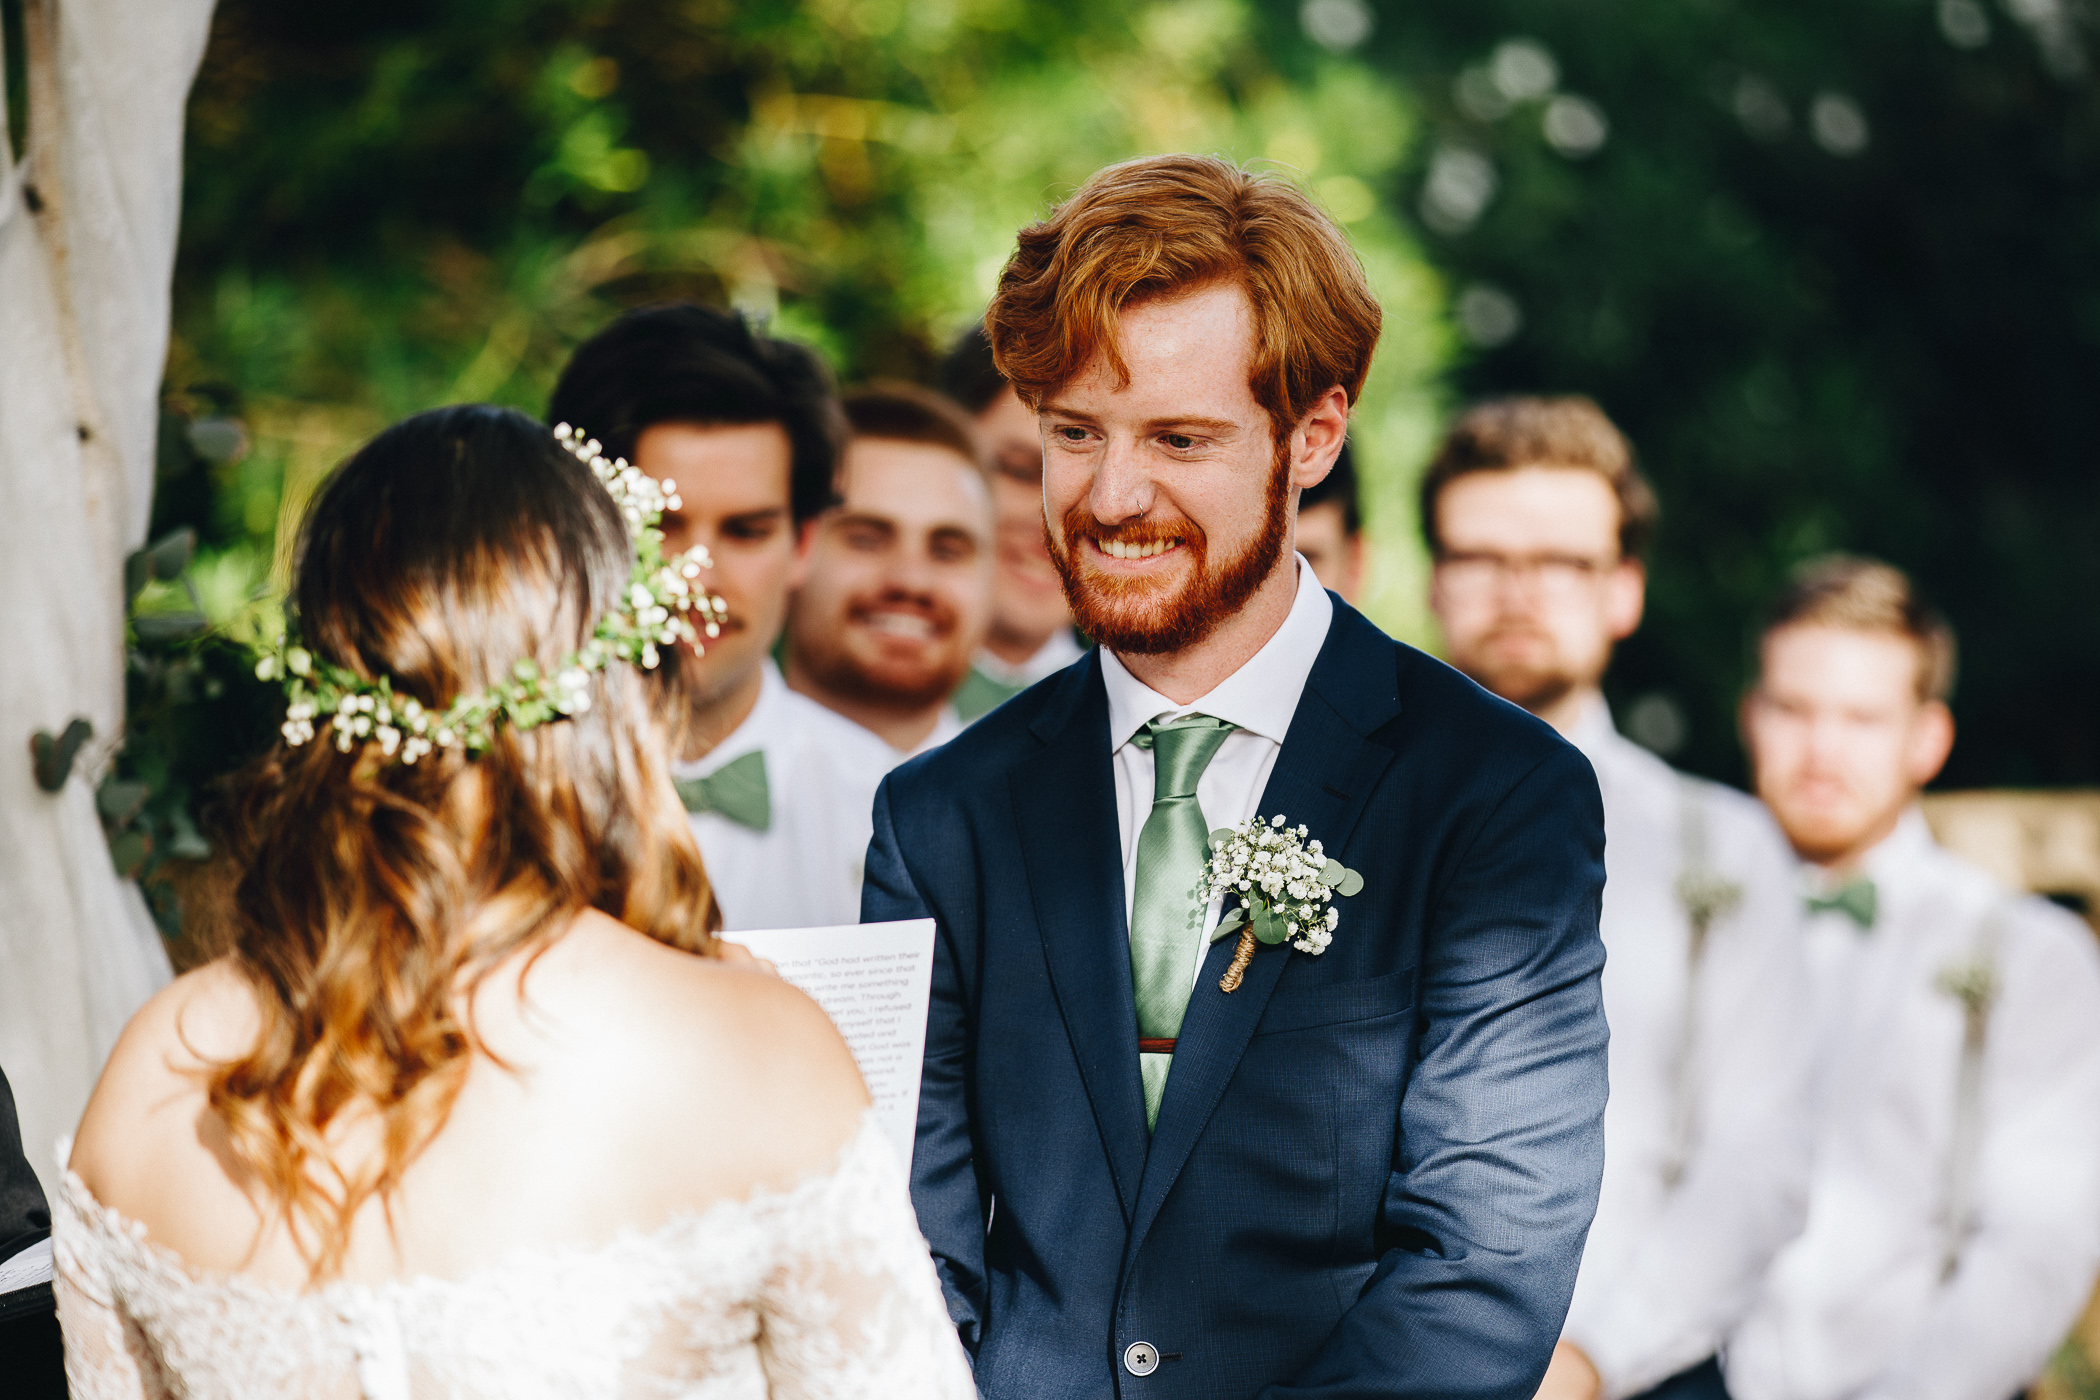 181104-Luxium-Weddings-Arizona-@matt__Le-Brandon-Kariana-Phoenix-Valley-Garden-Center-1067.jpg